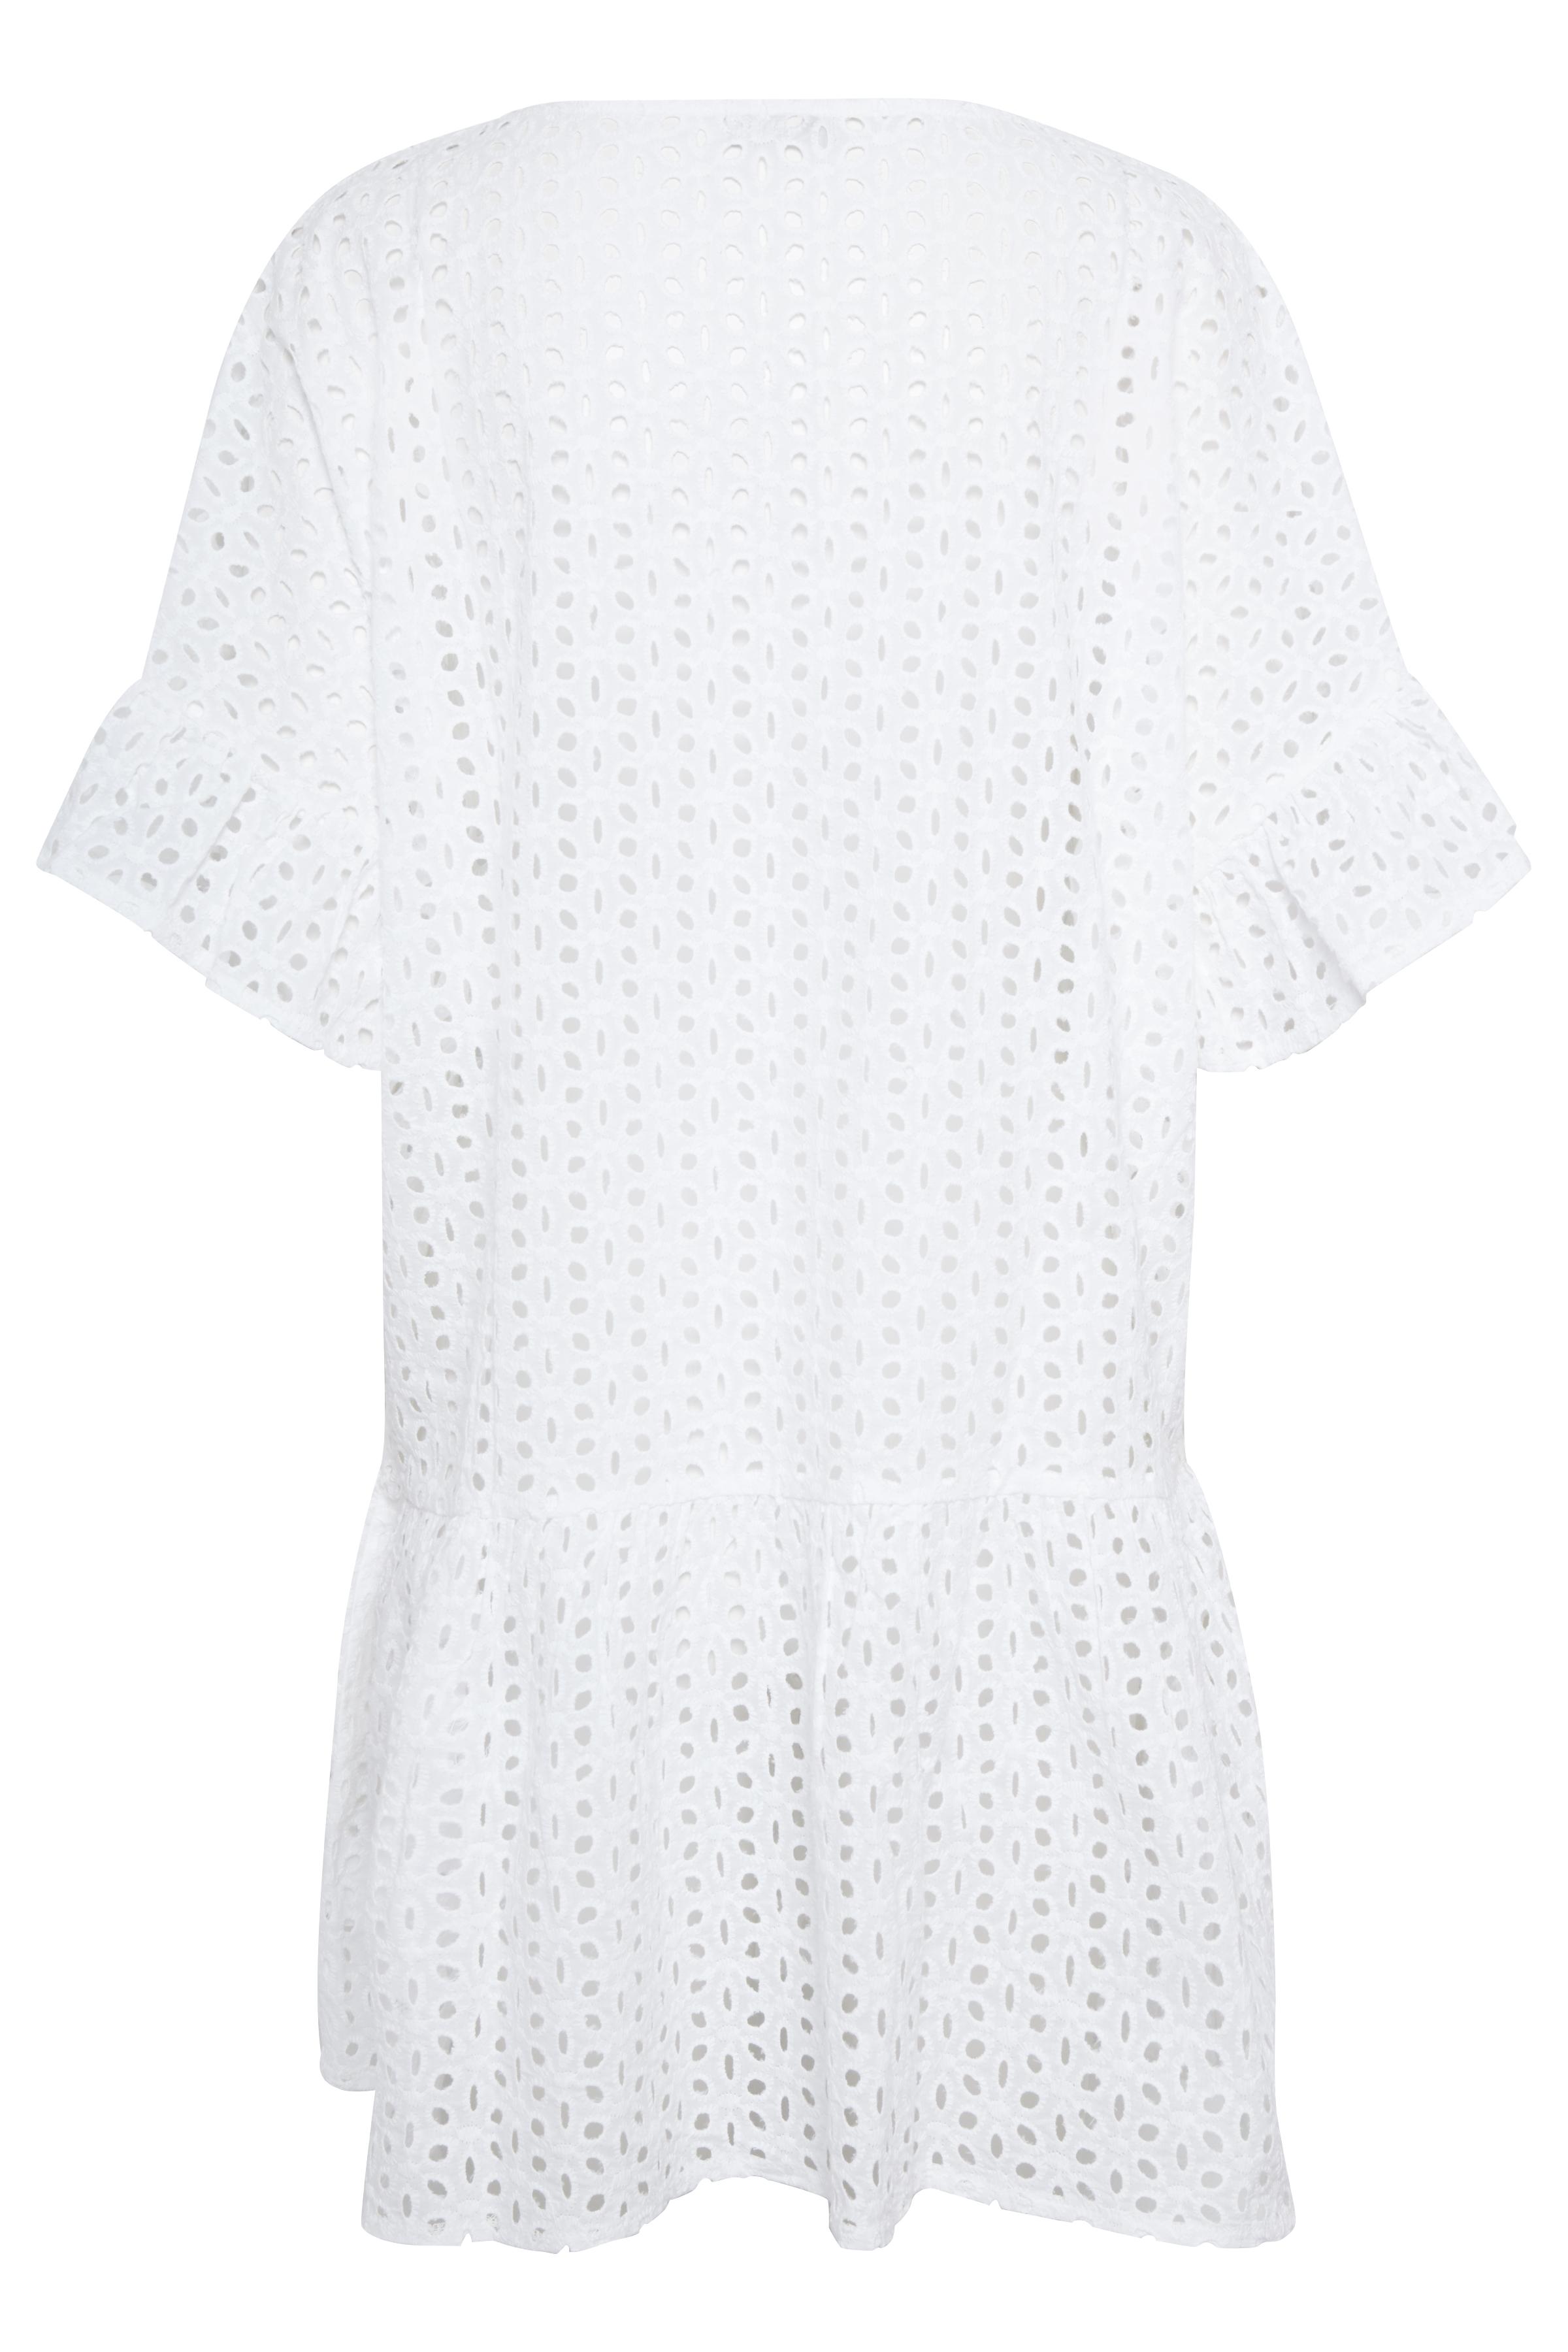 To be specified Kimono til brug over badetøj  – Køb To be specified Kimono til brug over badetøj  fra str. XS/S-M/L her